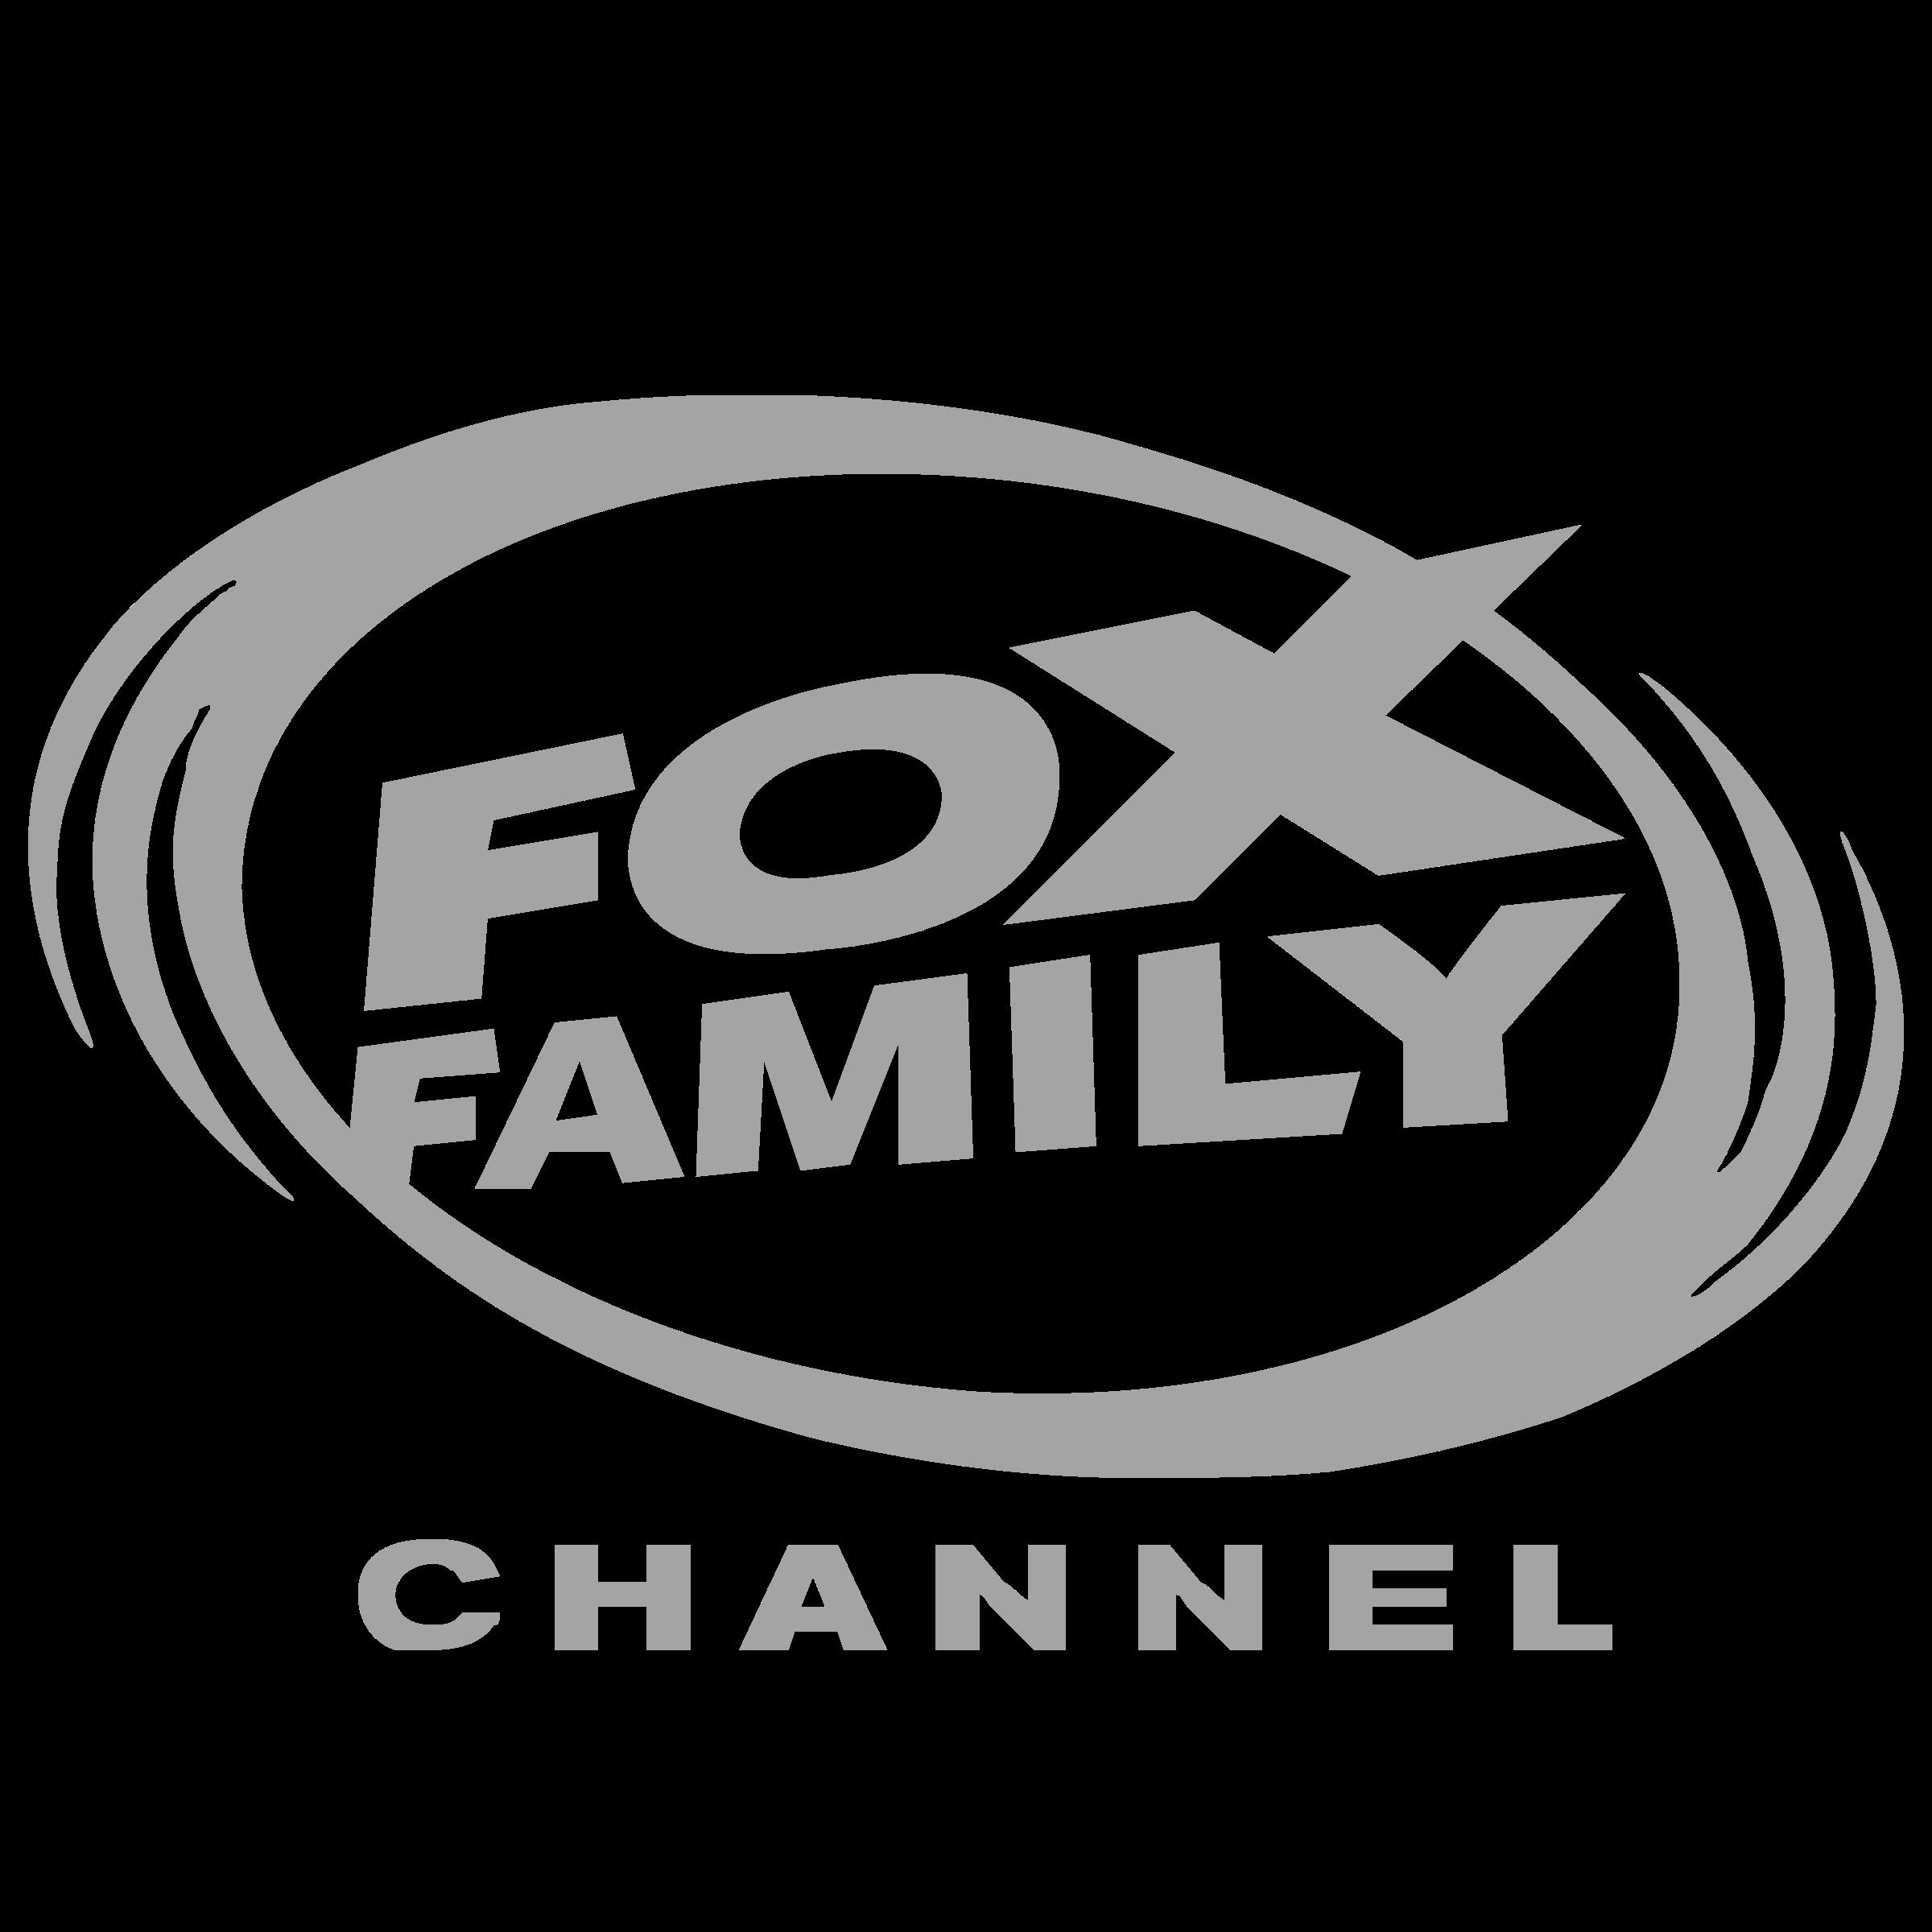 fox-family-logo-png-transparent.png